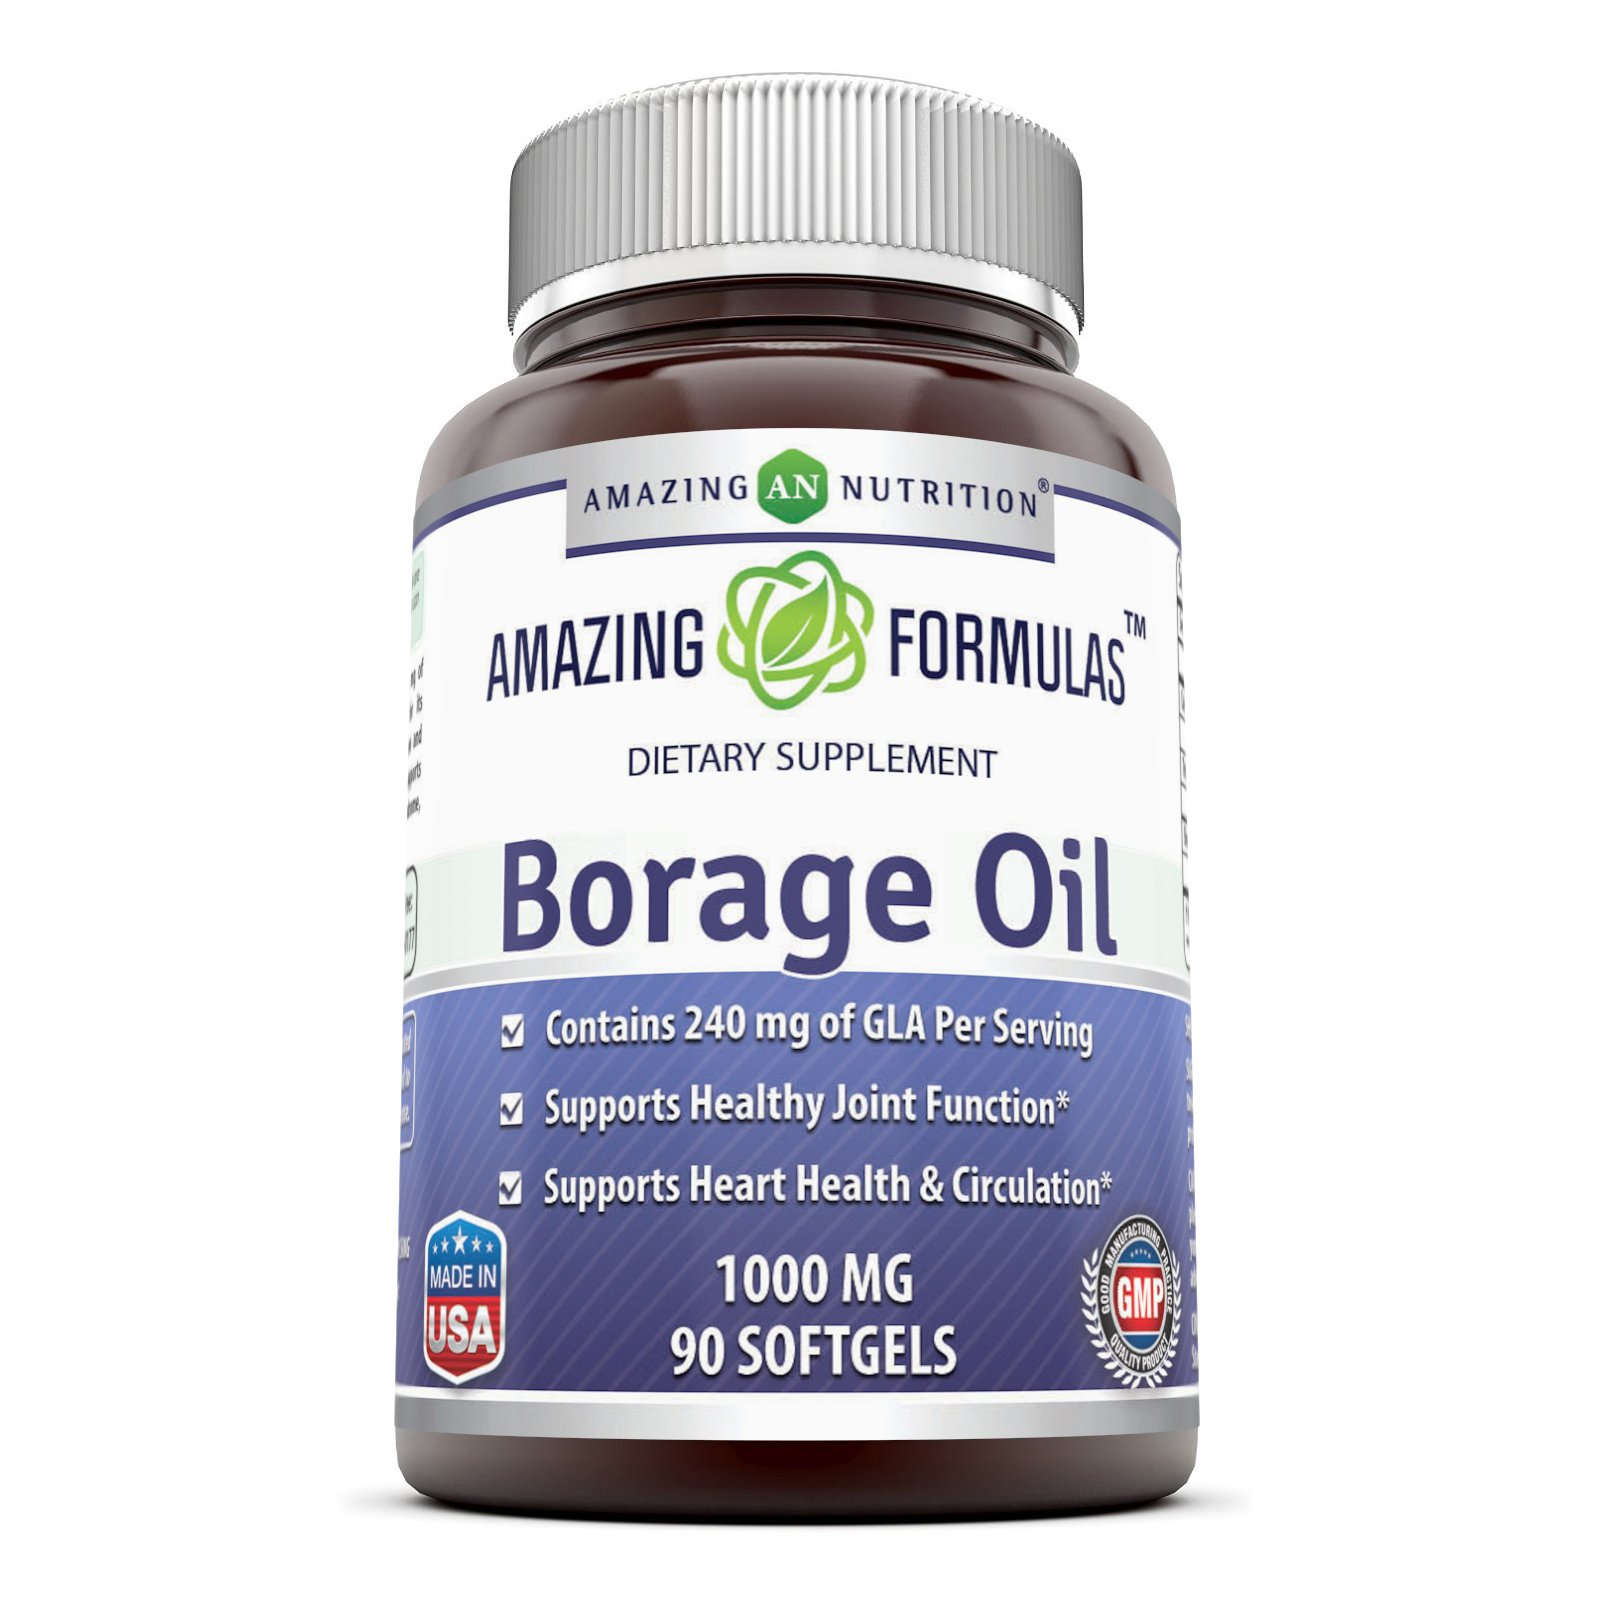 Amazing Formulas Borage Oil Dietary Supplement - 1000mg Capsules -90 SoftGels Per Bottle - 240mg Gamma Linoleic Acid (GLA) and 380mg Linoleic Acid -90 SoftGels Per Bottle